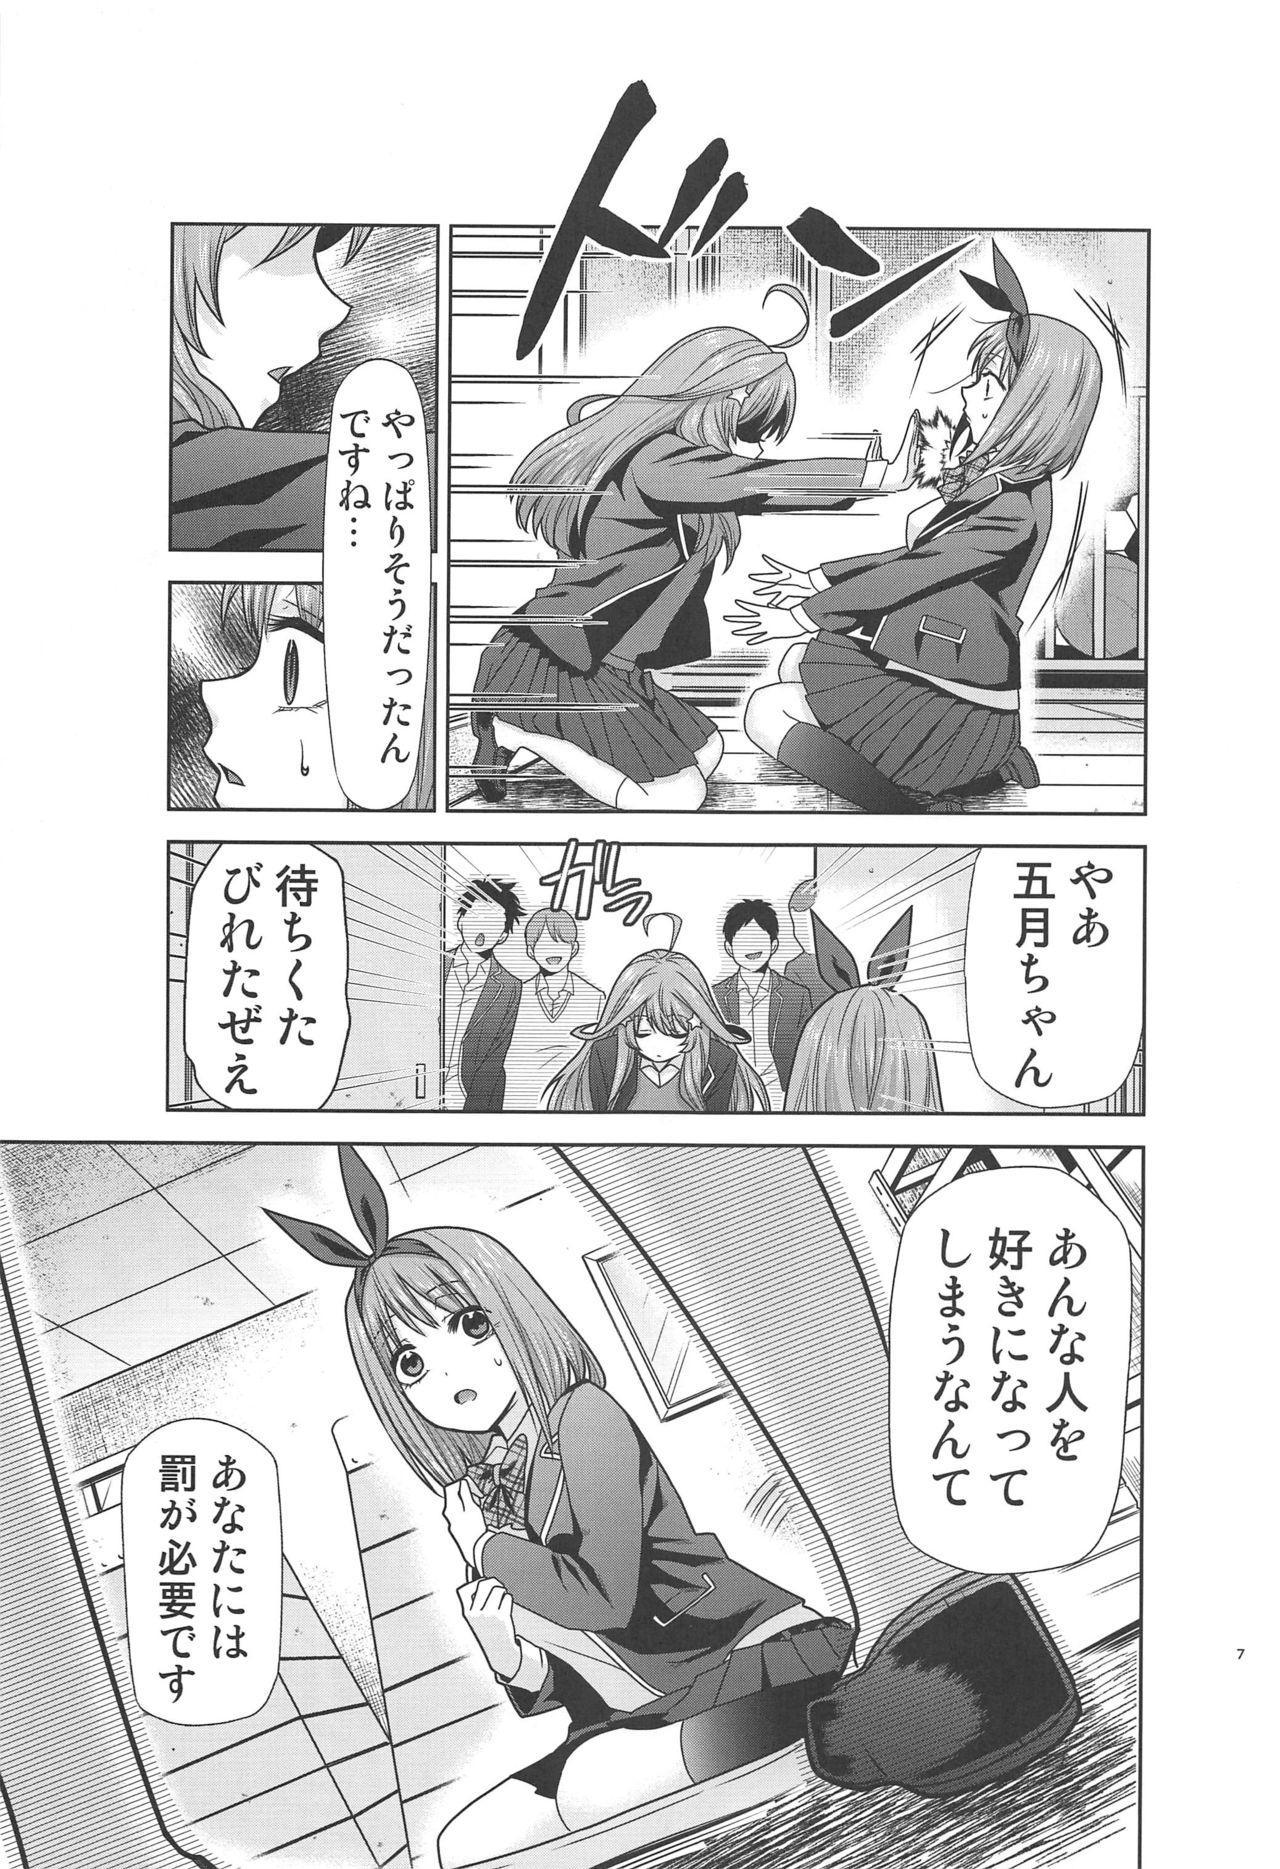 Gotoubun no Seidorei ∬ 21